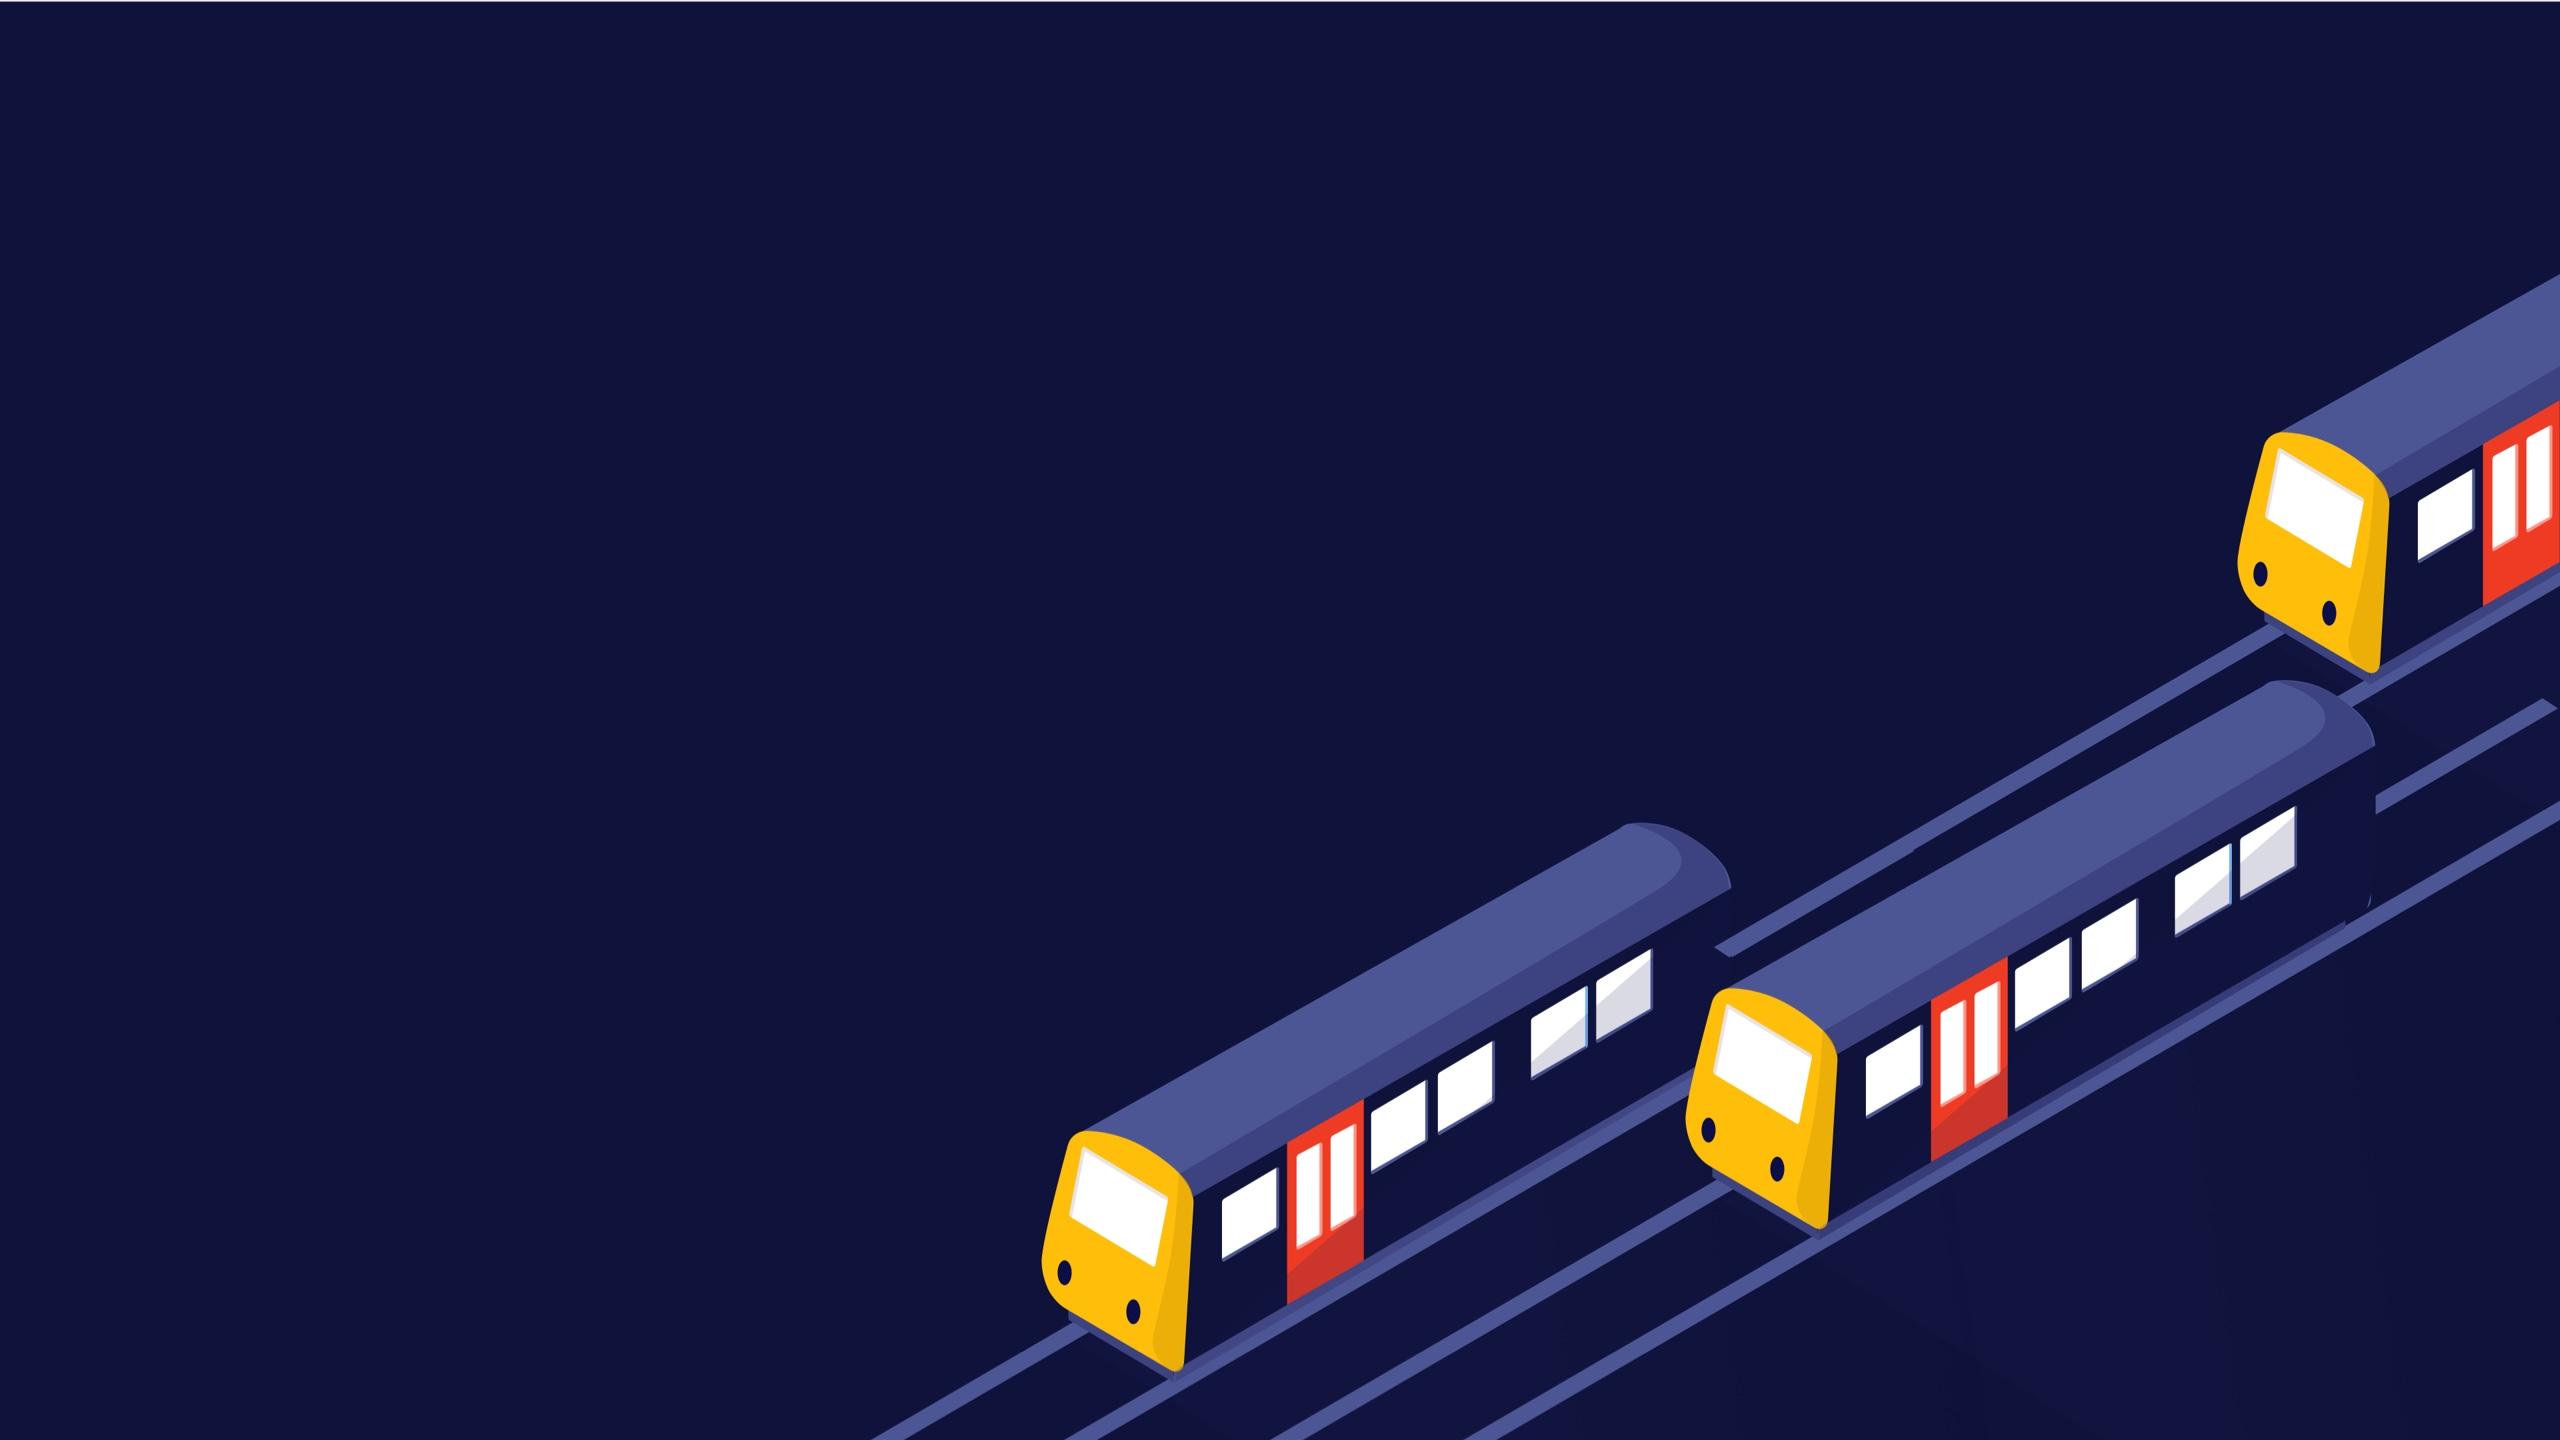 Illustration of three trains on the track